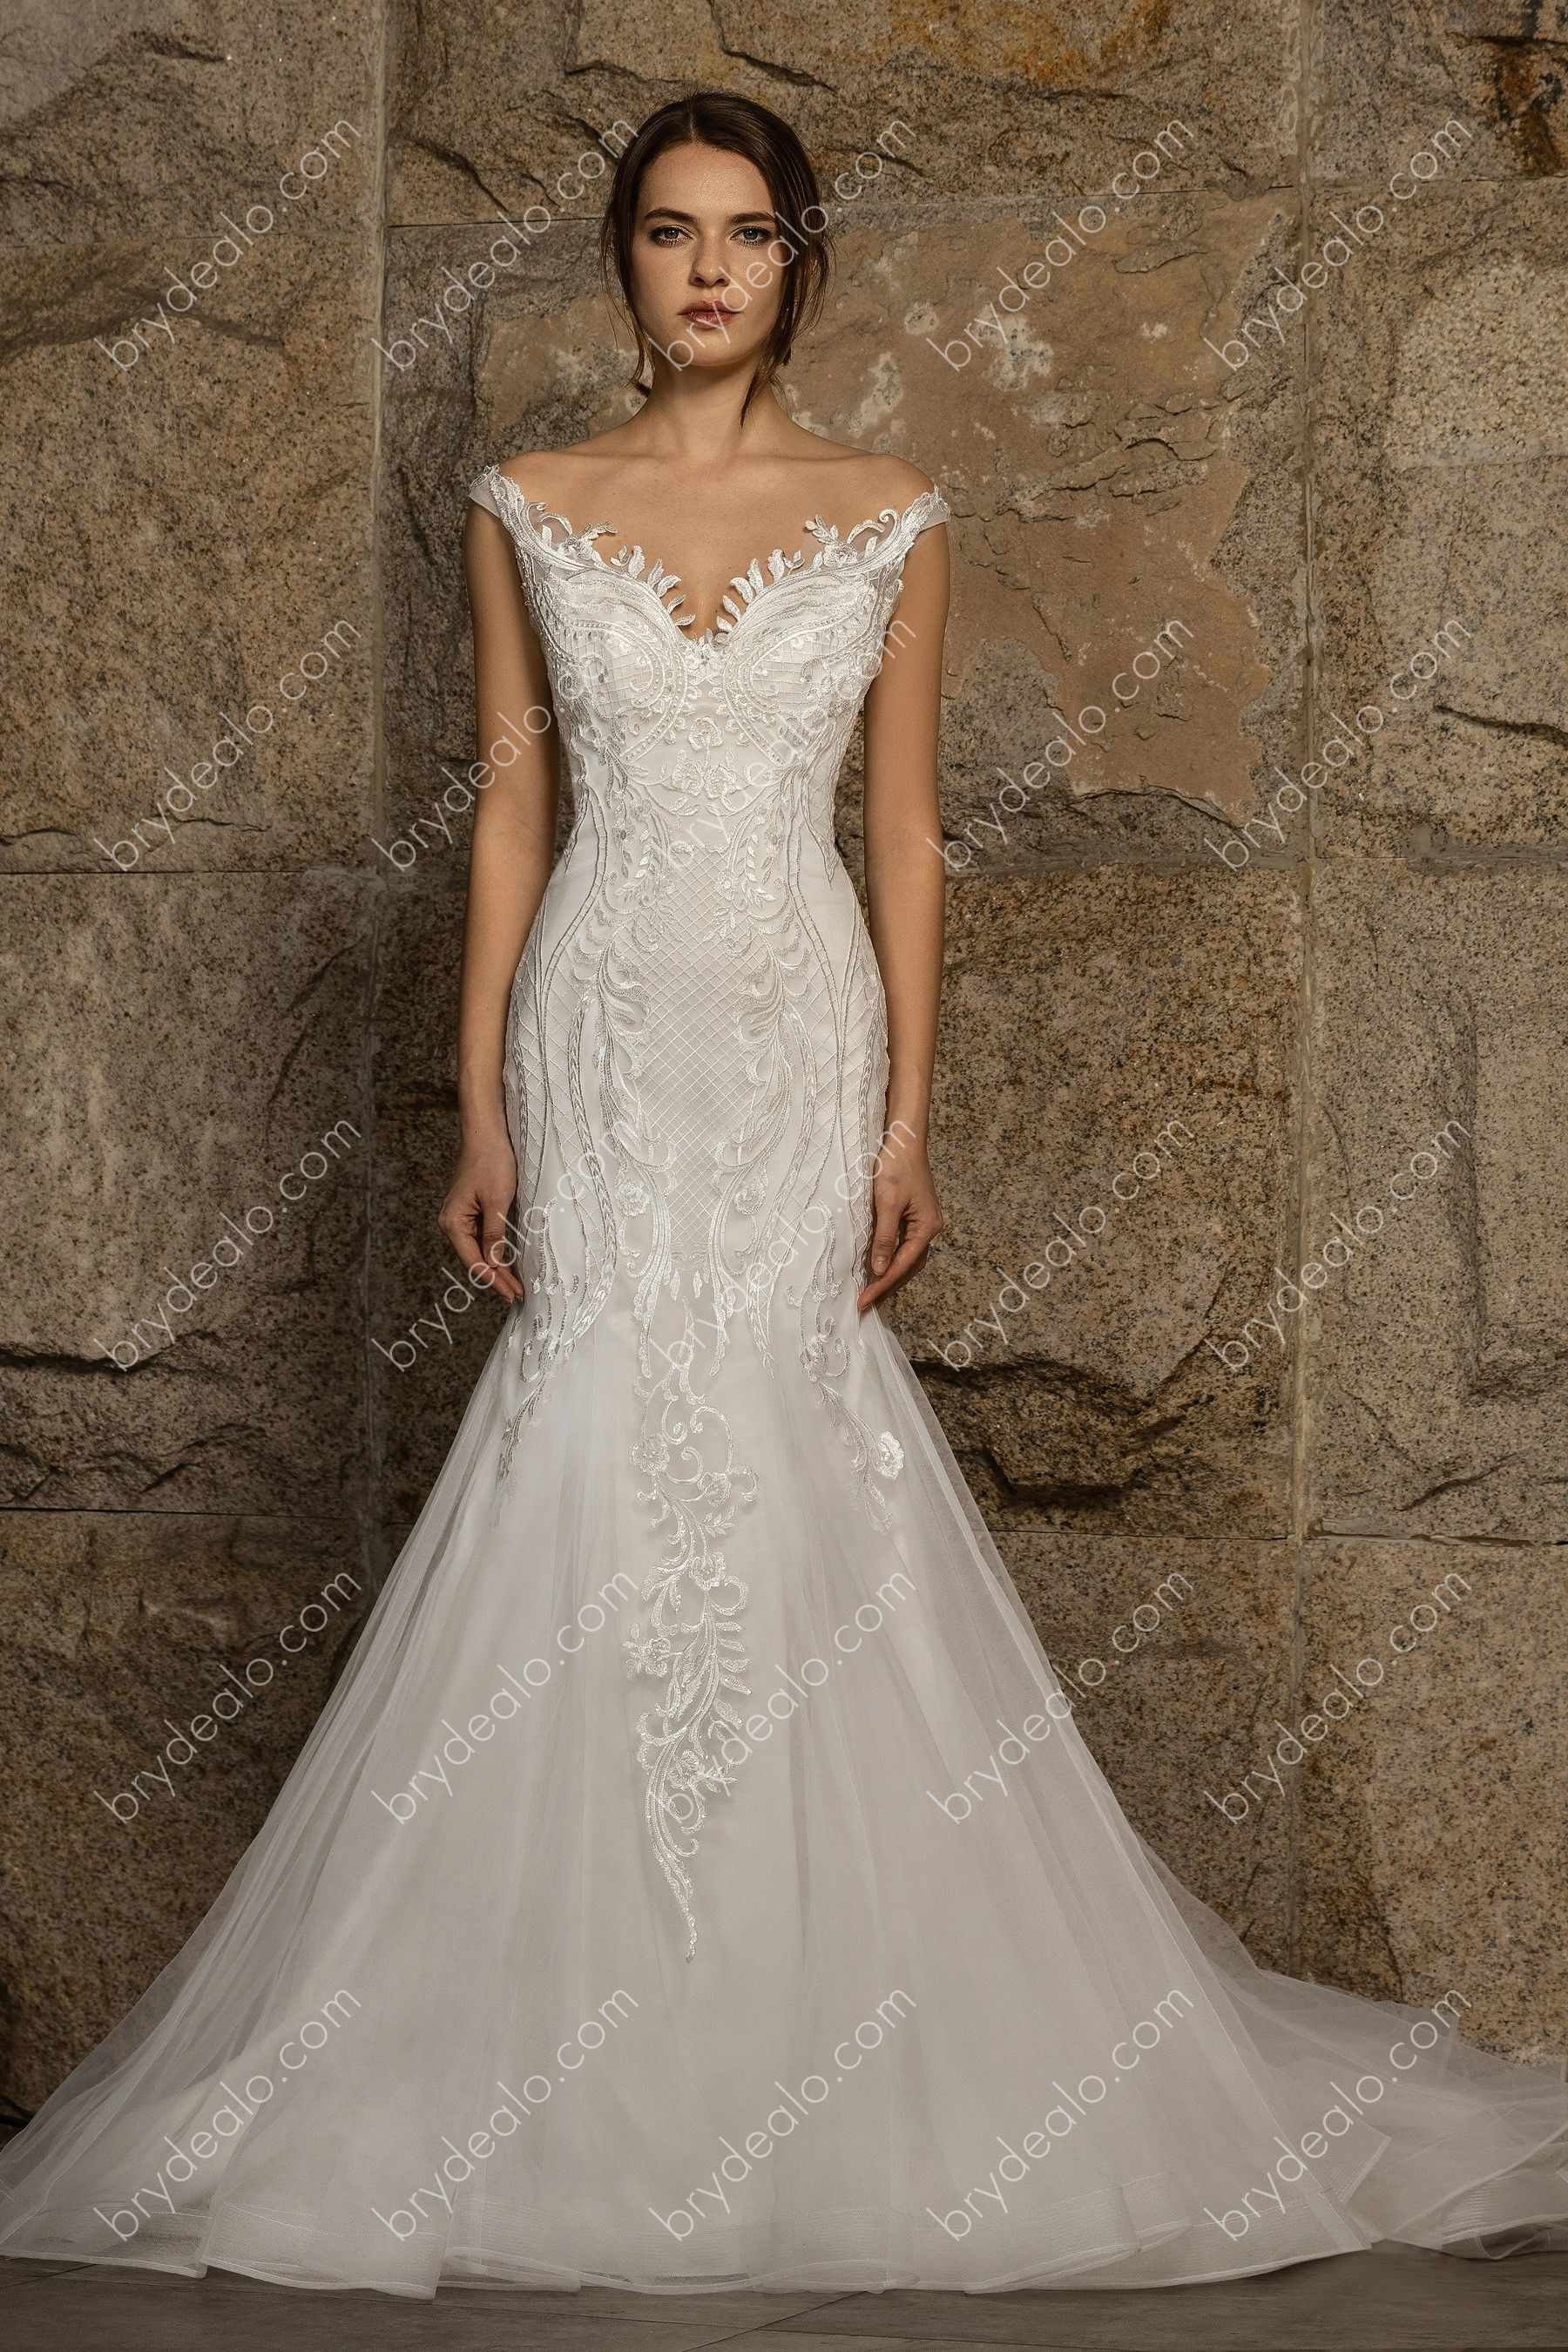 Elegant Illusion Back Mermaid Wedding Dress In 2021 Wedding Gowns Mermaid Mermaid Wedding Dress Sheer Wedding Dress [ 2700 x 1800 Pixel ]